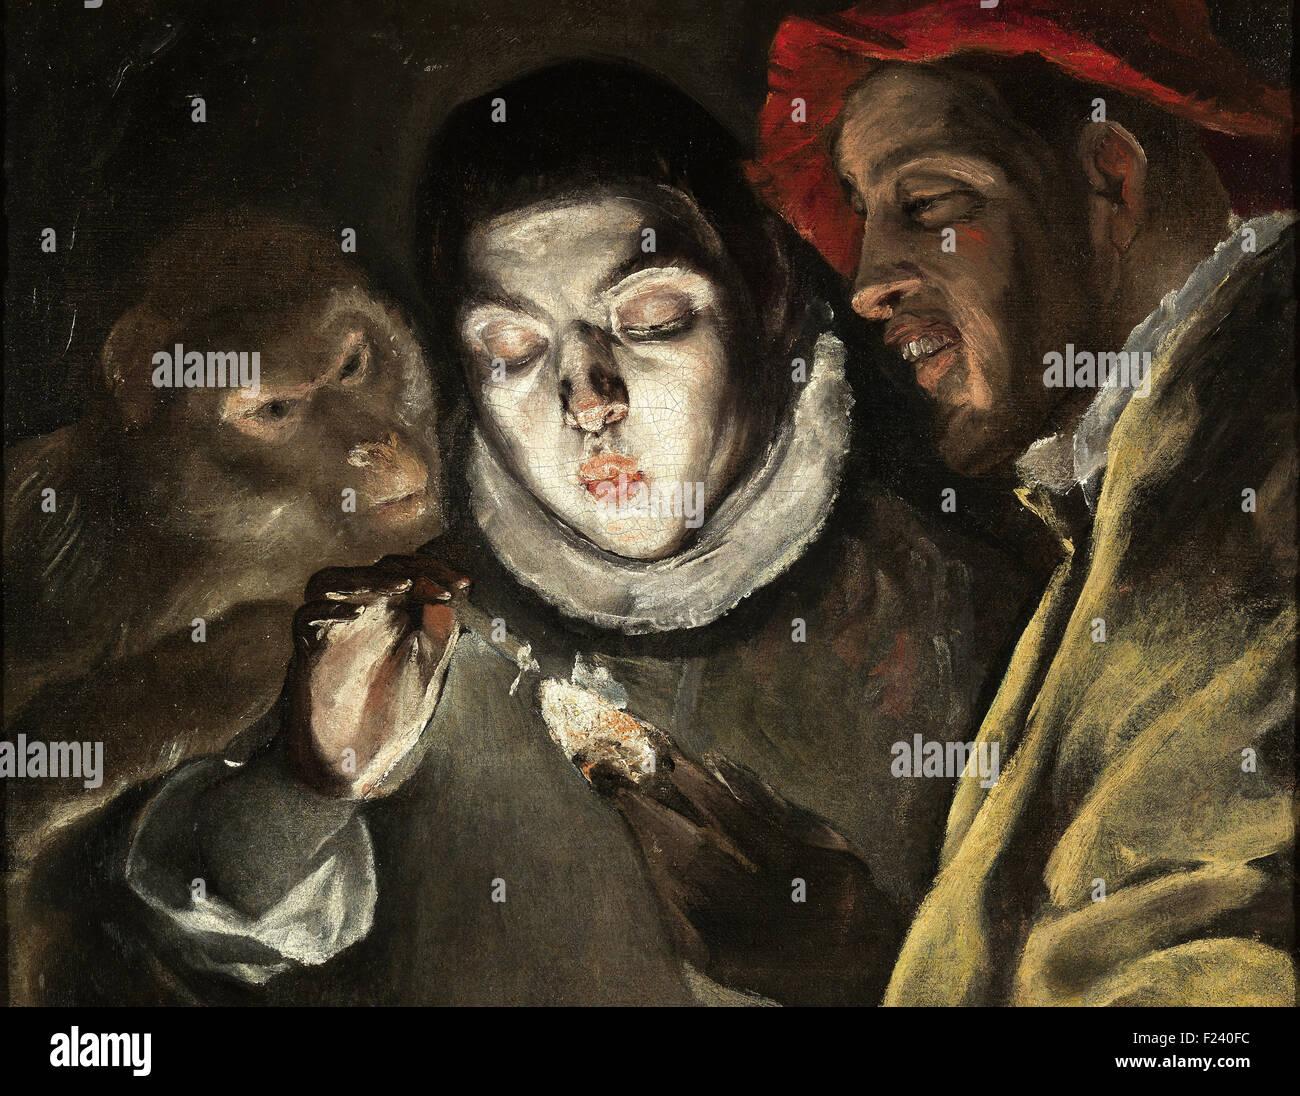 El Greco - Fable - Stock Image